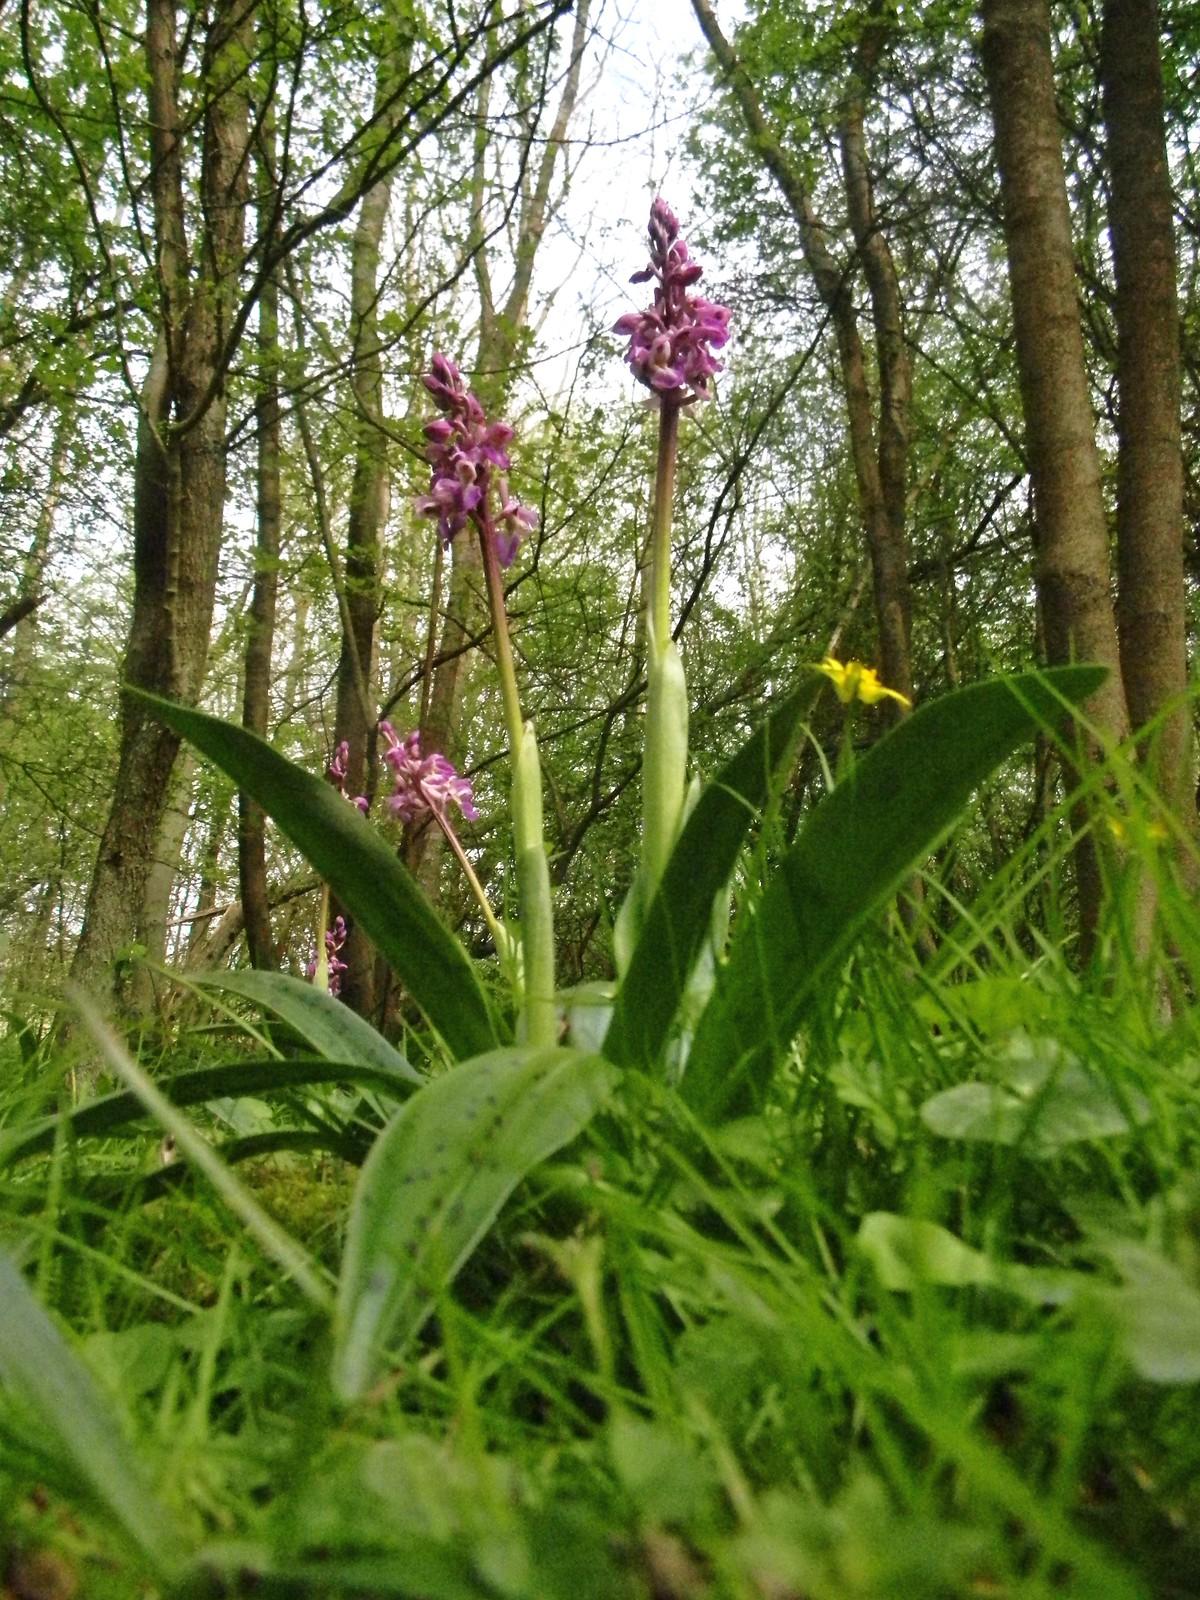 Early Purple Orchid Yalding to Sevenoaks